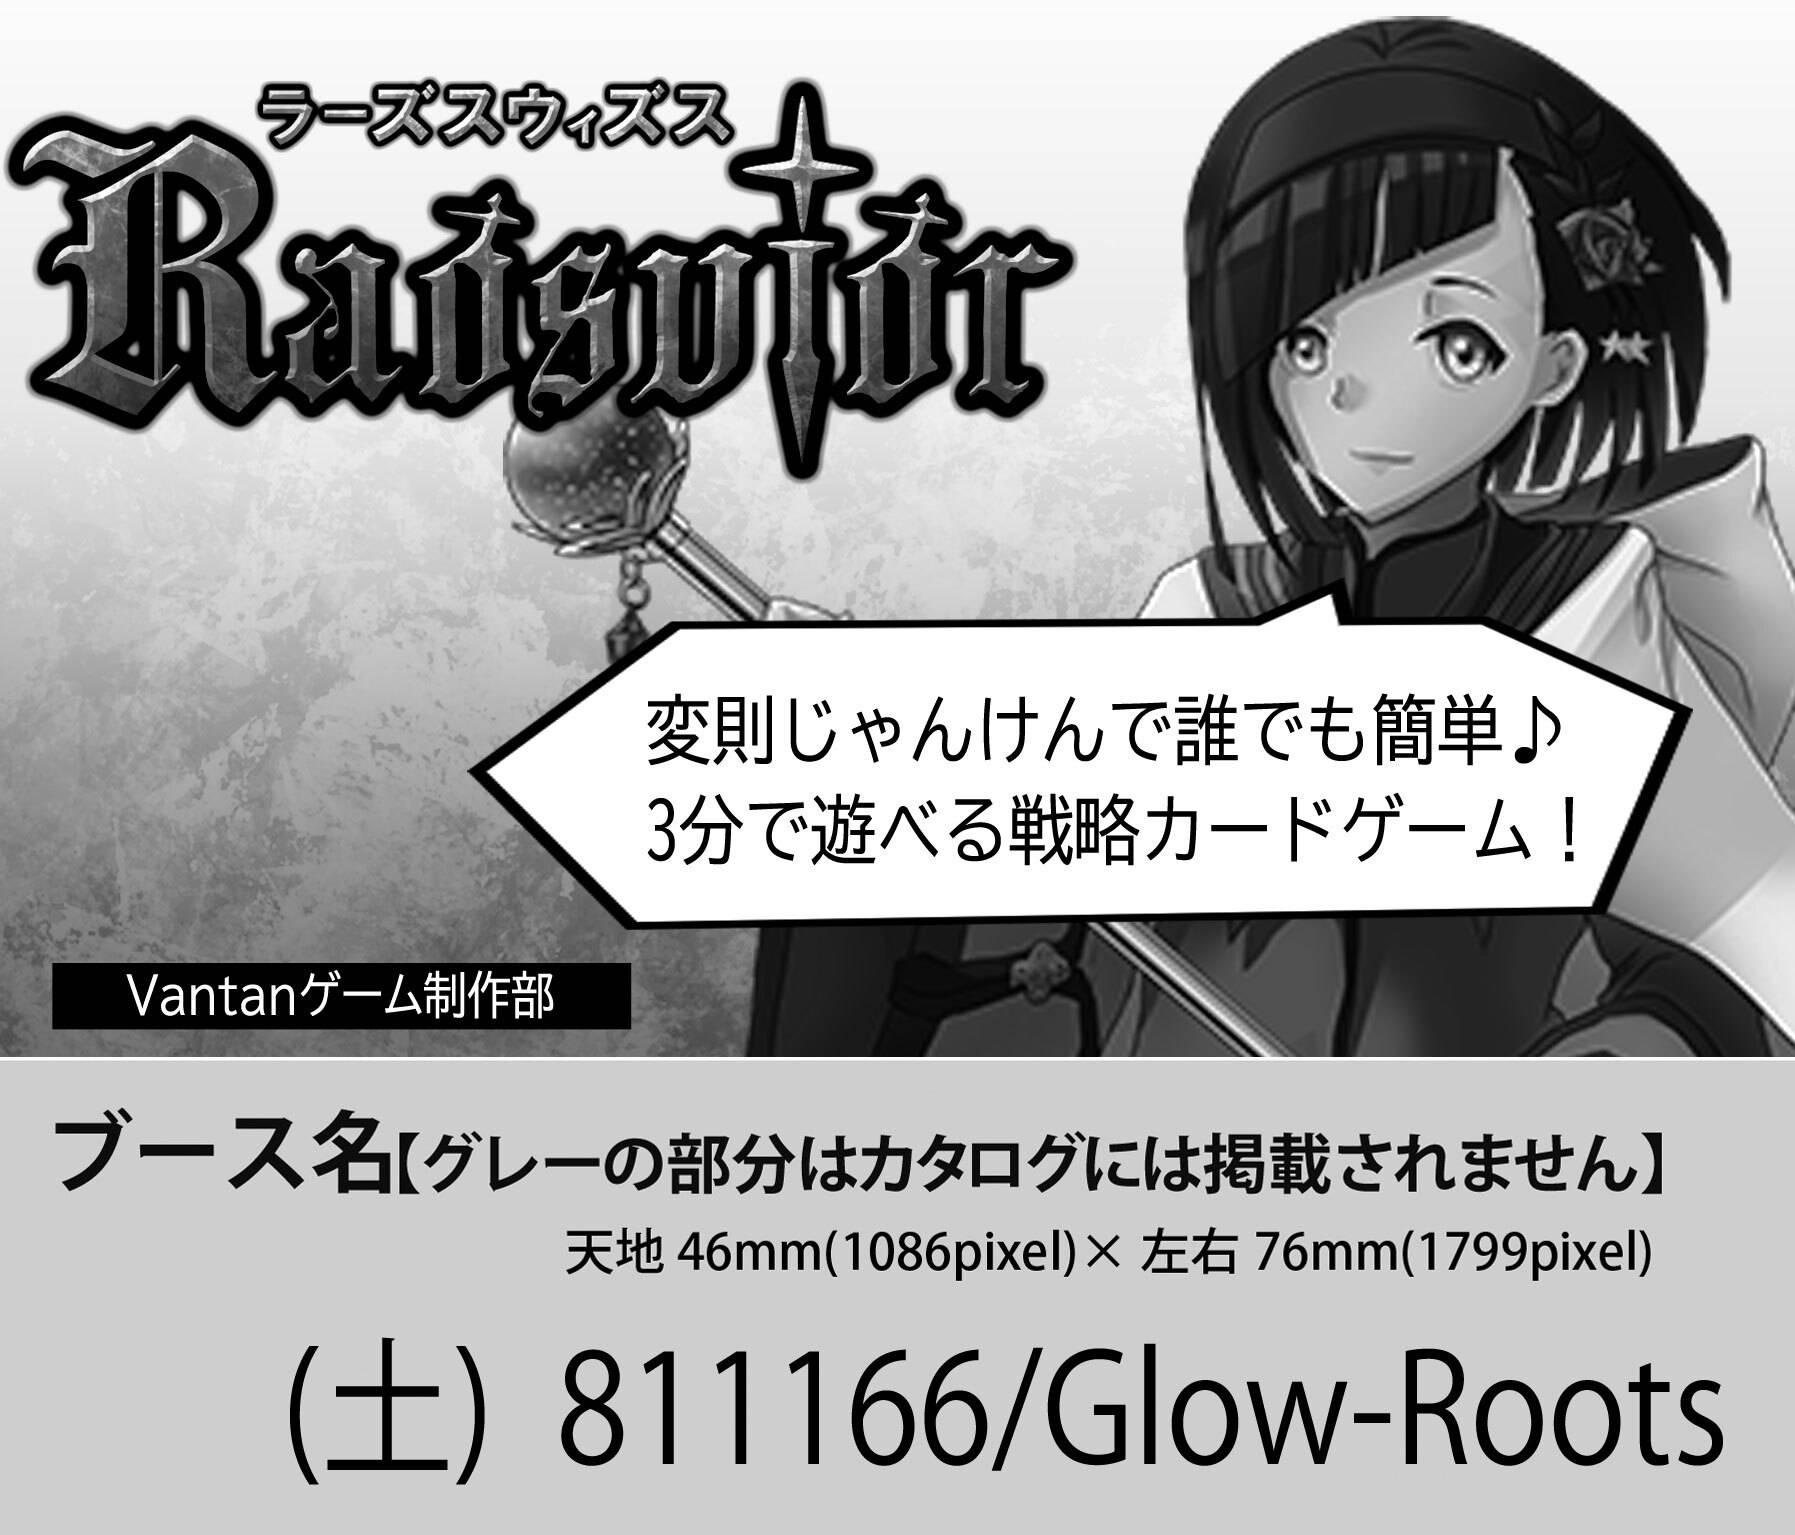 Glow-Roots画像